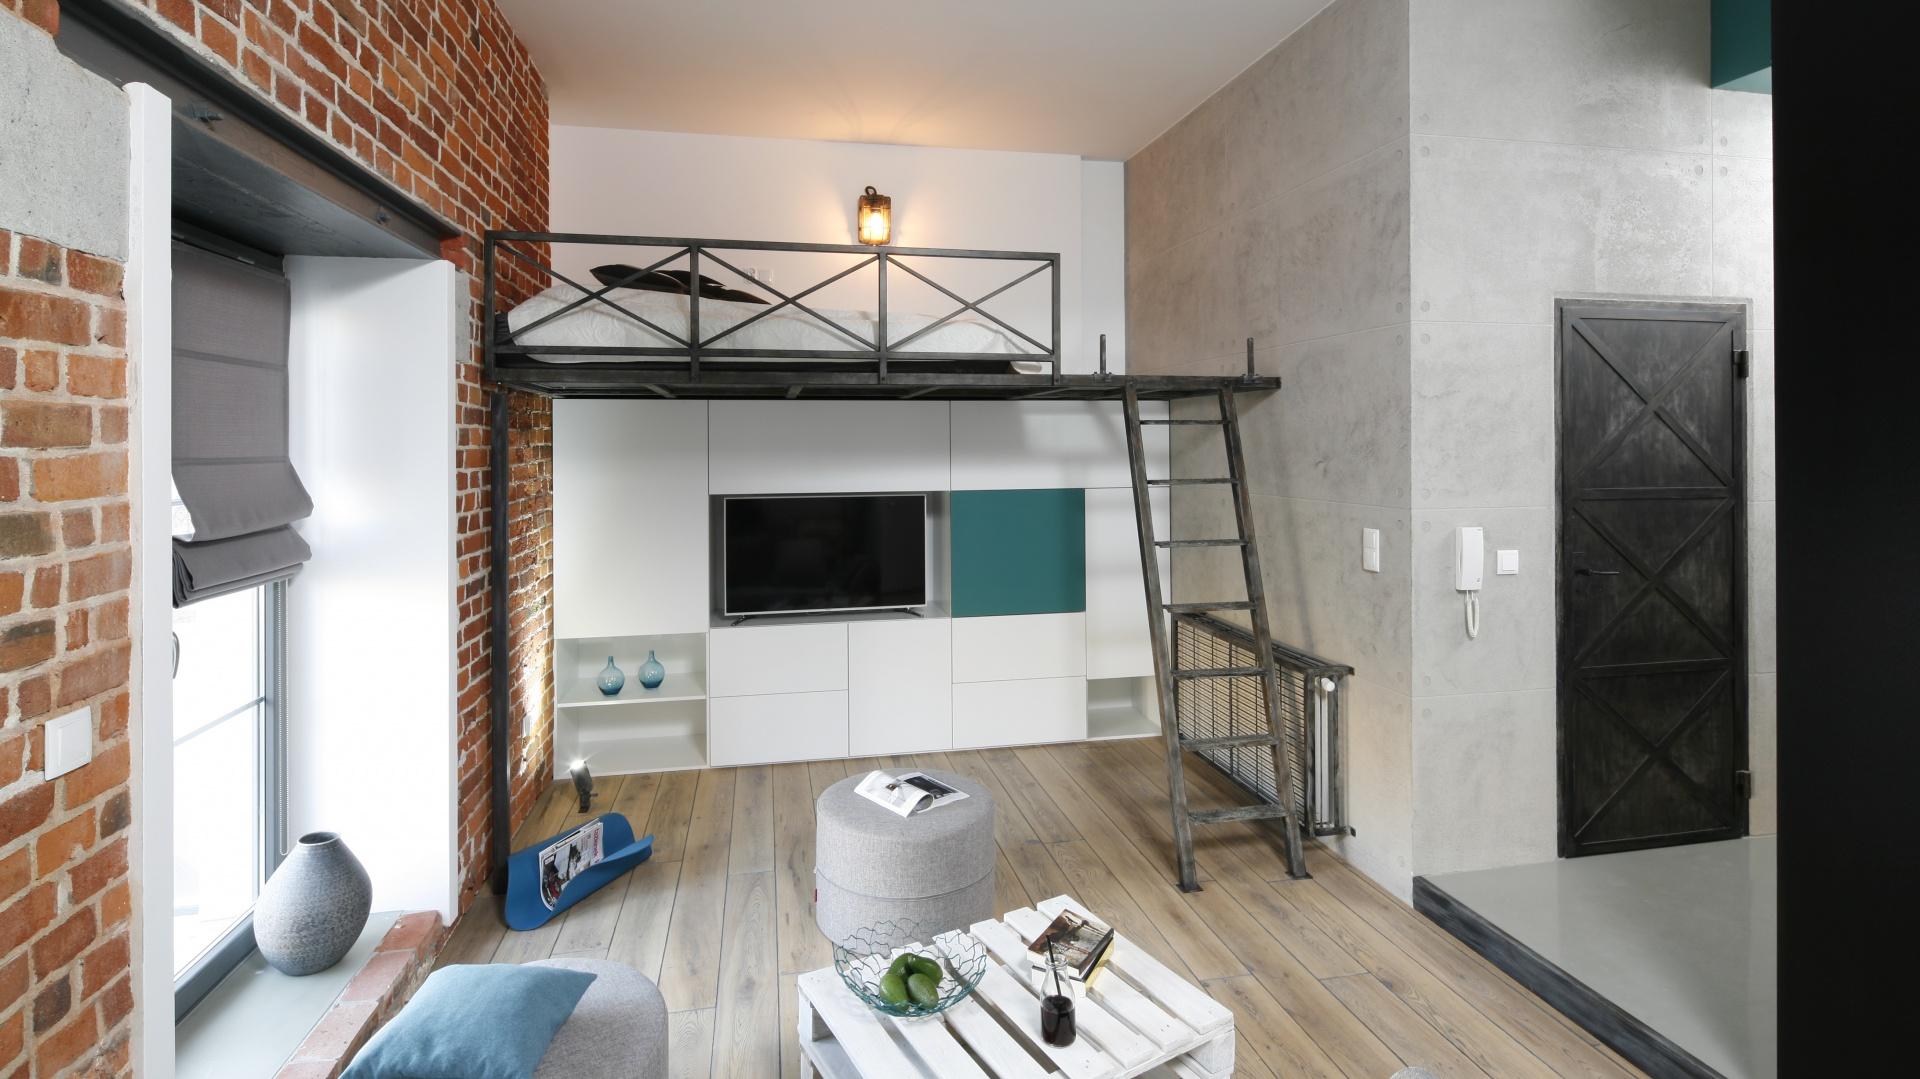 salon z antresol projekt 9 pomys w na aran acj trudnego salonu. Black Bedroom Furniture Sets. Home Design Ideas